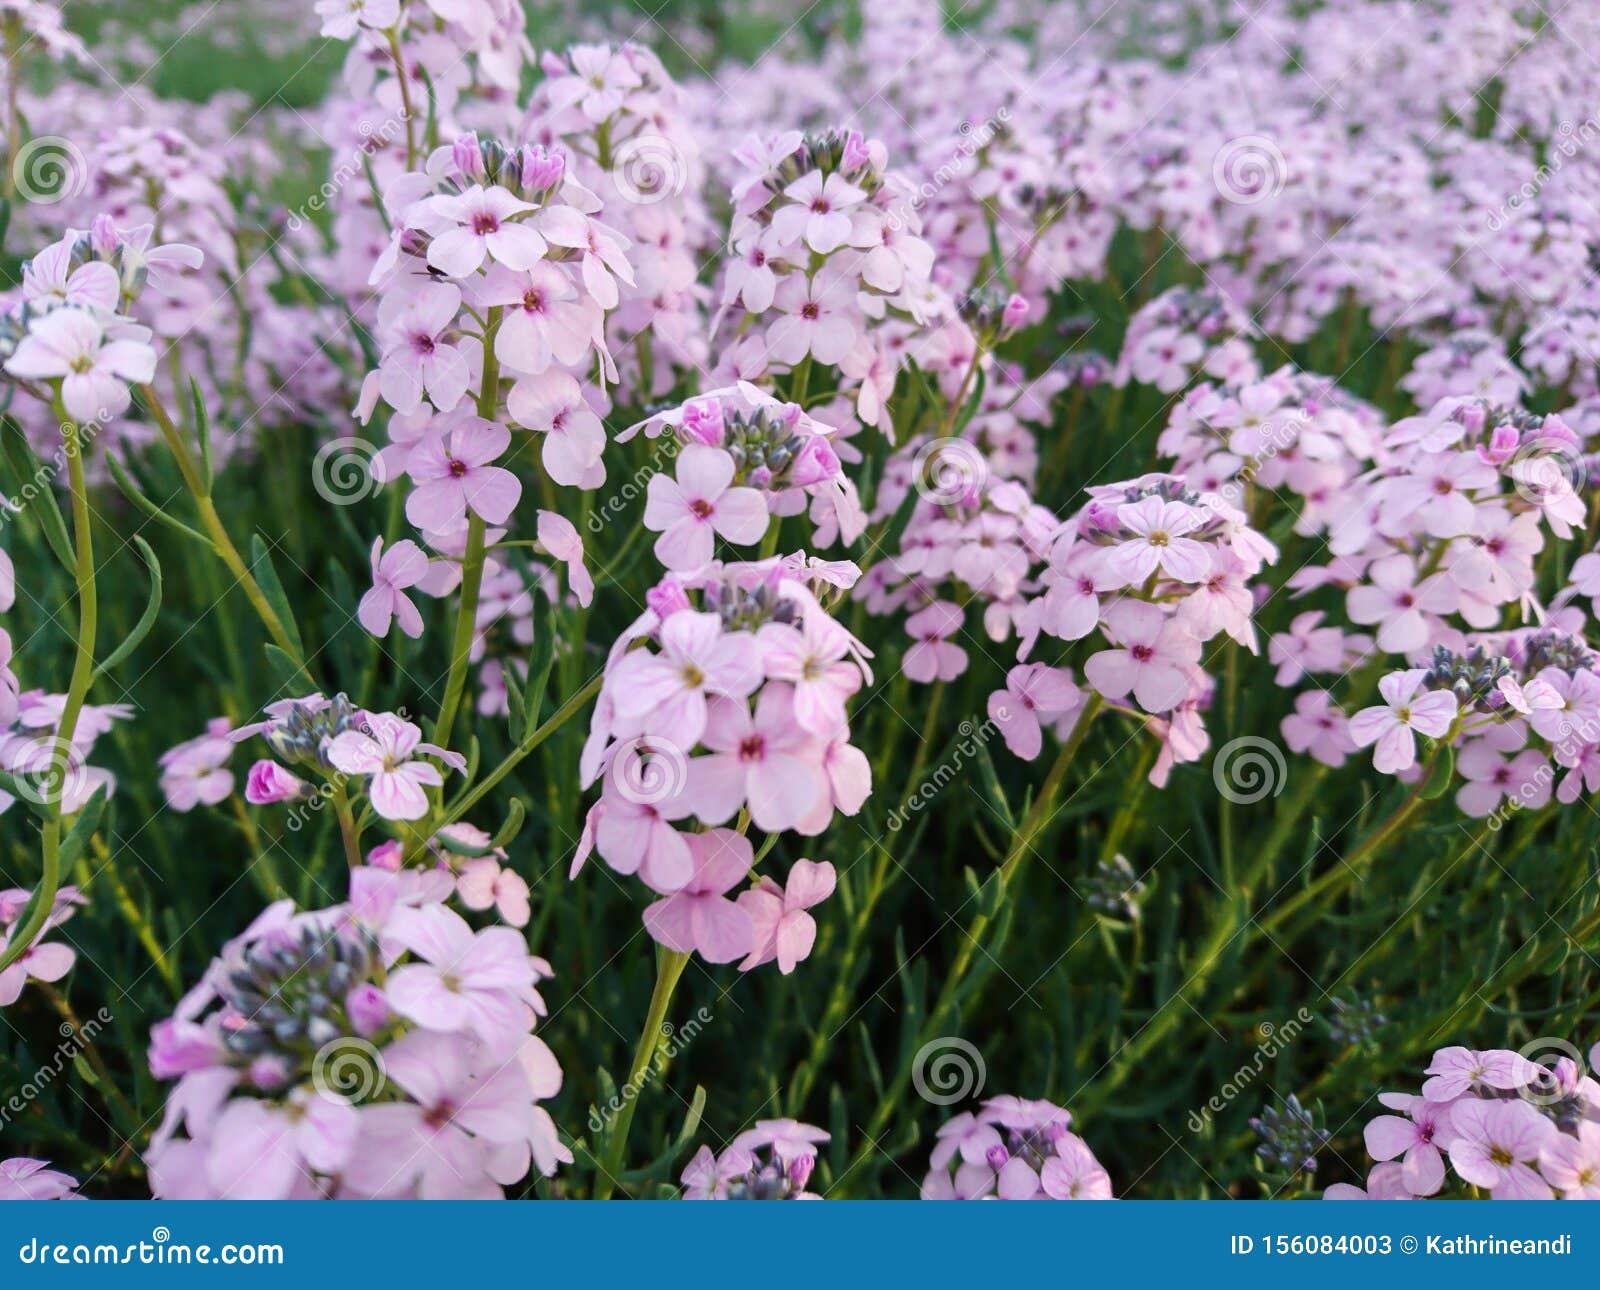 Lots of pink purple flowers macro nice nature background